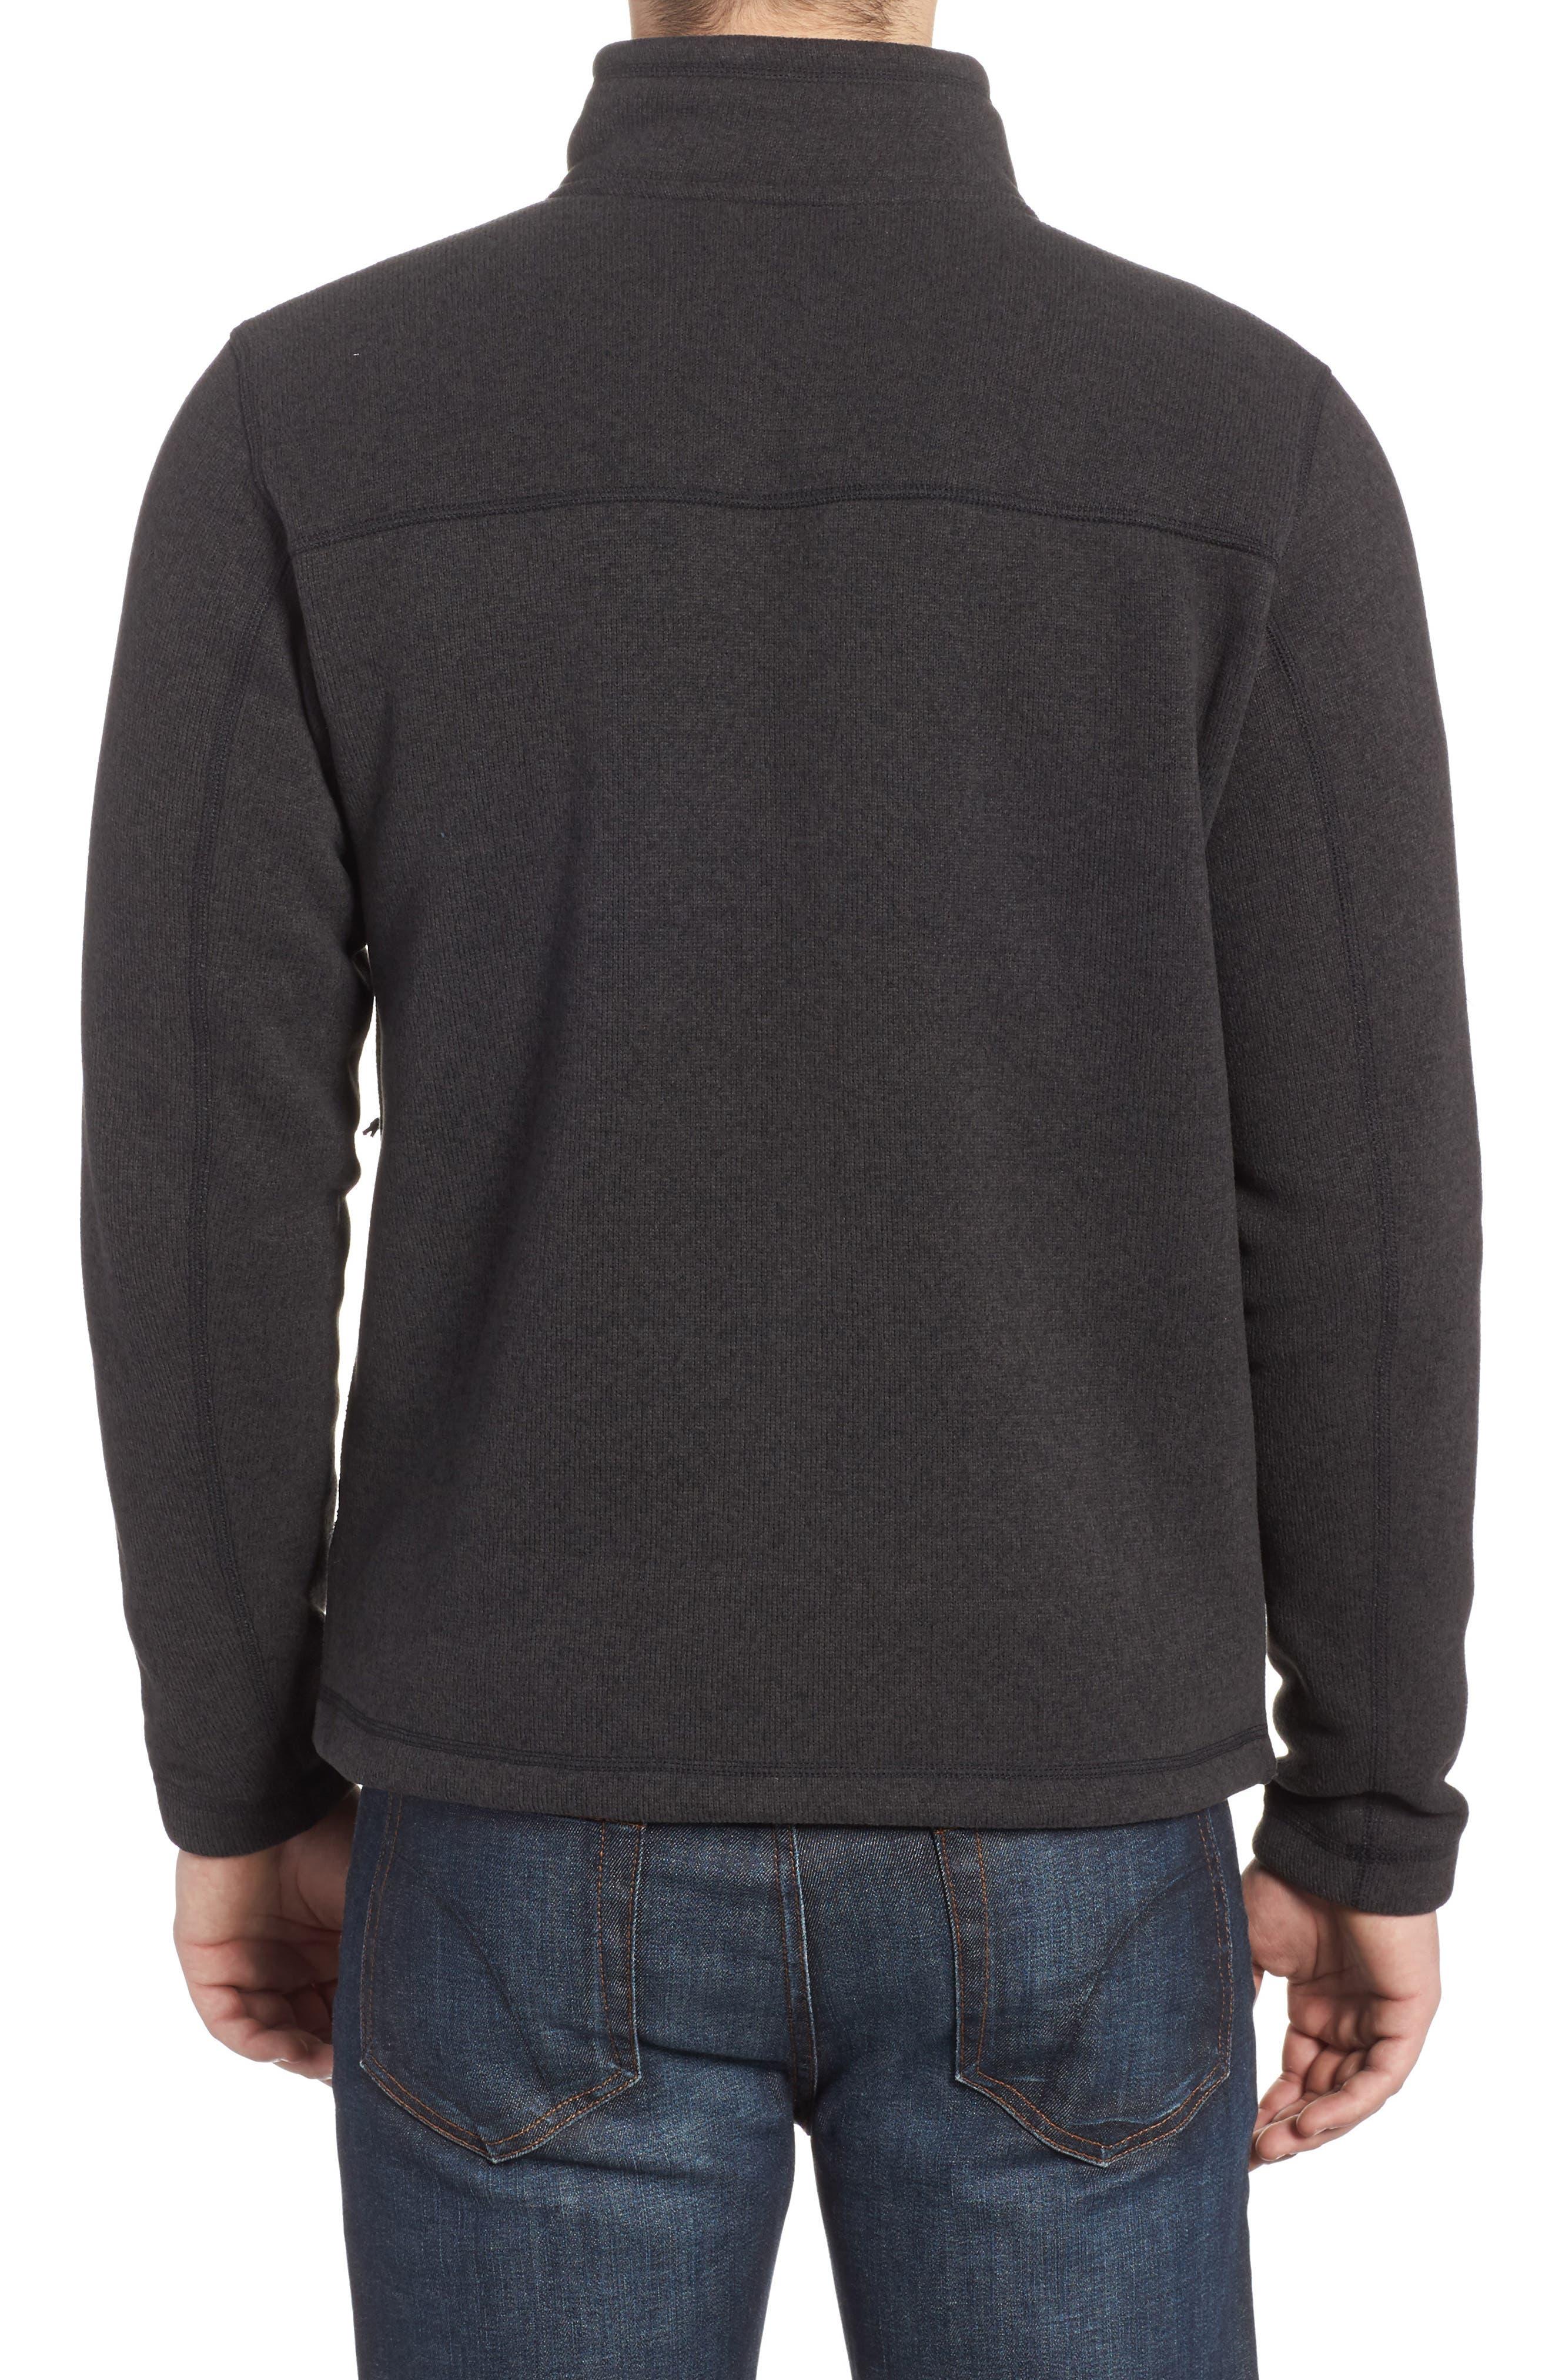 THE NORTH FACE, 'Gordon Lyons' Zip Fleece Jacket, Alternate thumbnail 2, color, 001